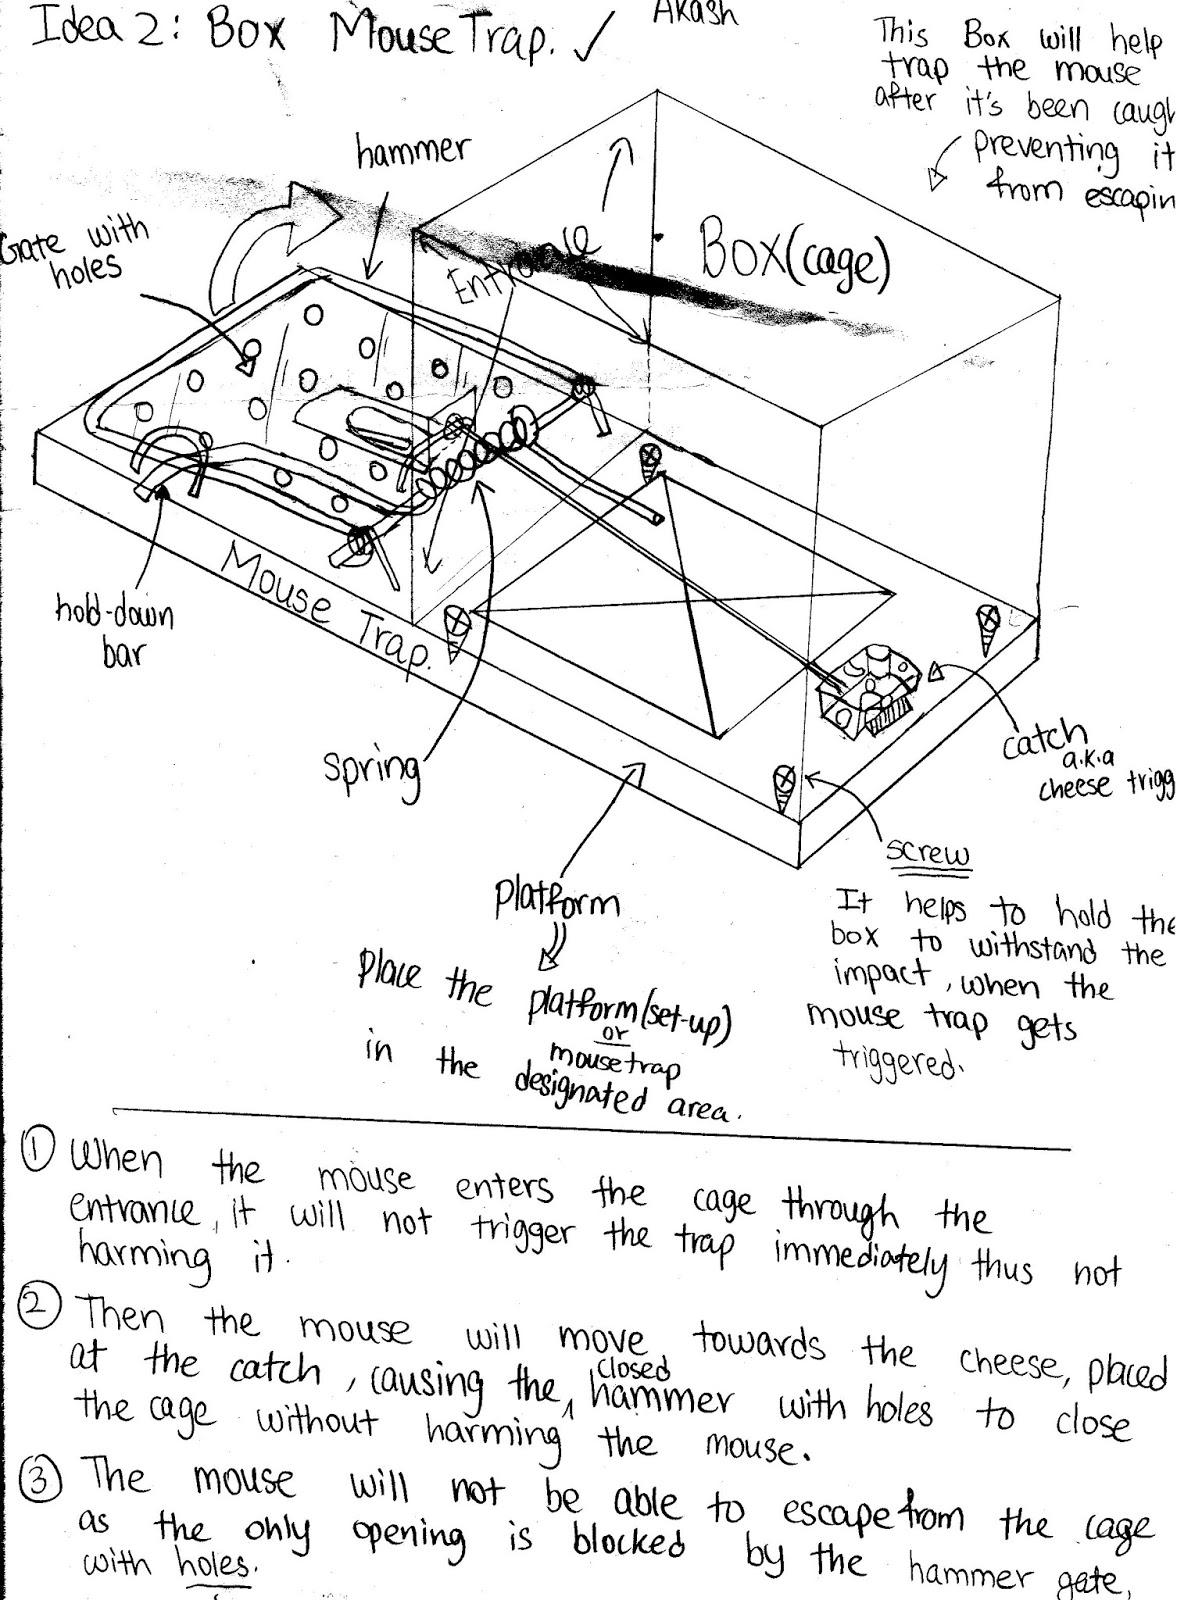 meyer e58h wiring harnes wiring diagram database Fisher Snow Plow Wiring Harness meyer snow plow wiring wiring diagram database scag wiring harness meyer e58h wiring harnes